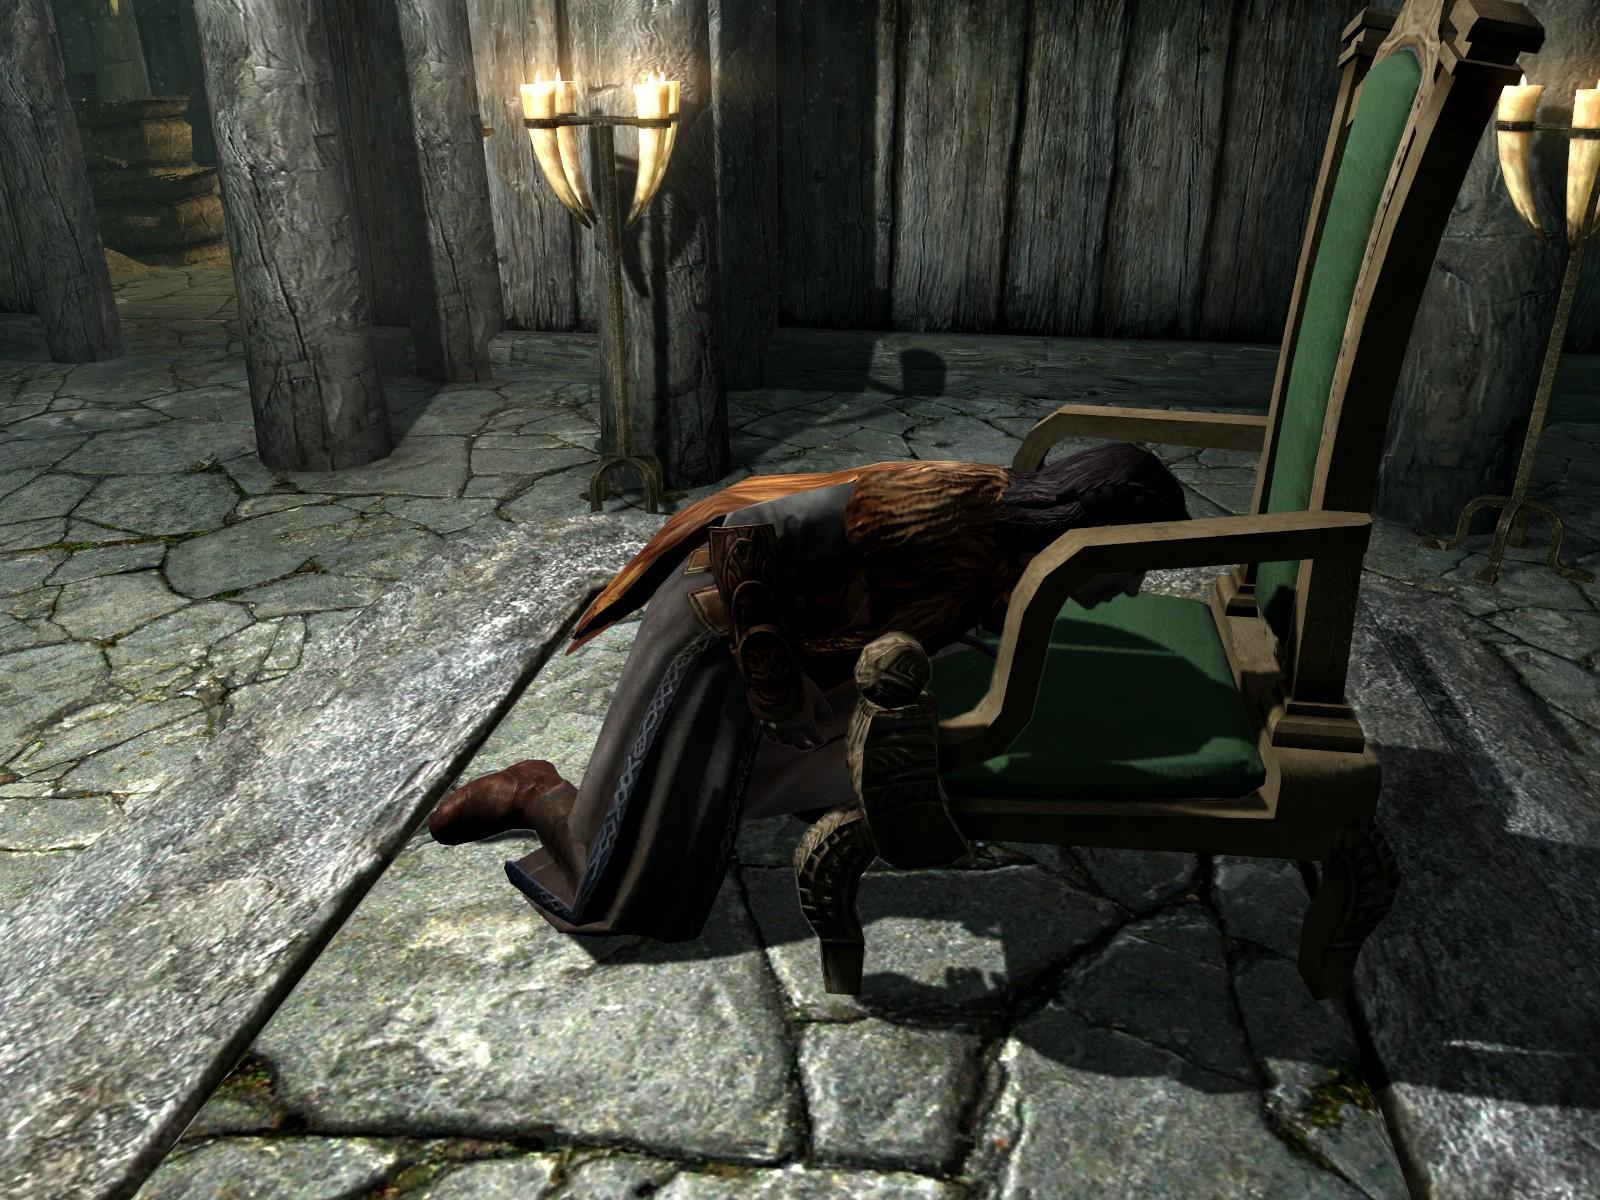 darkepyon games because dont posts read lawn things edit master skyrim elder scrolls psvr there hiding sword